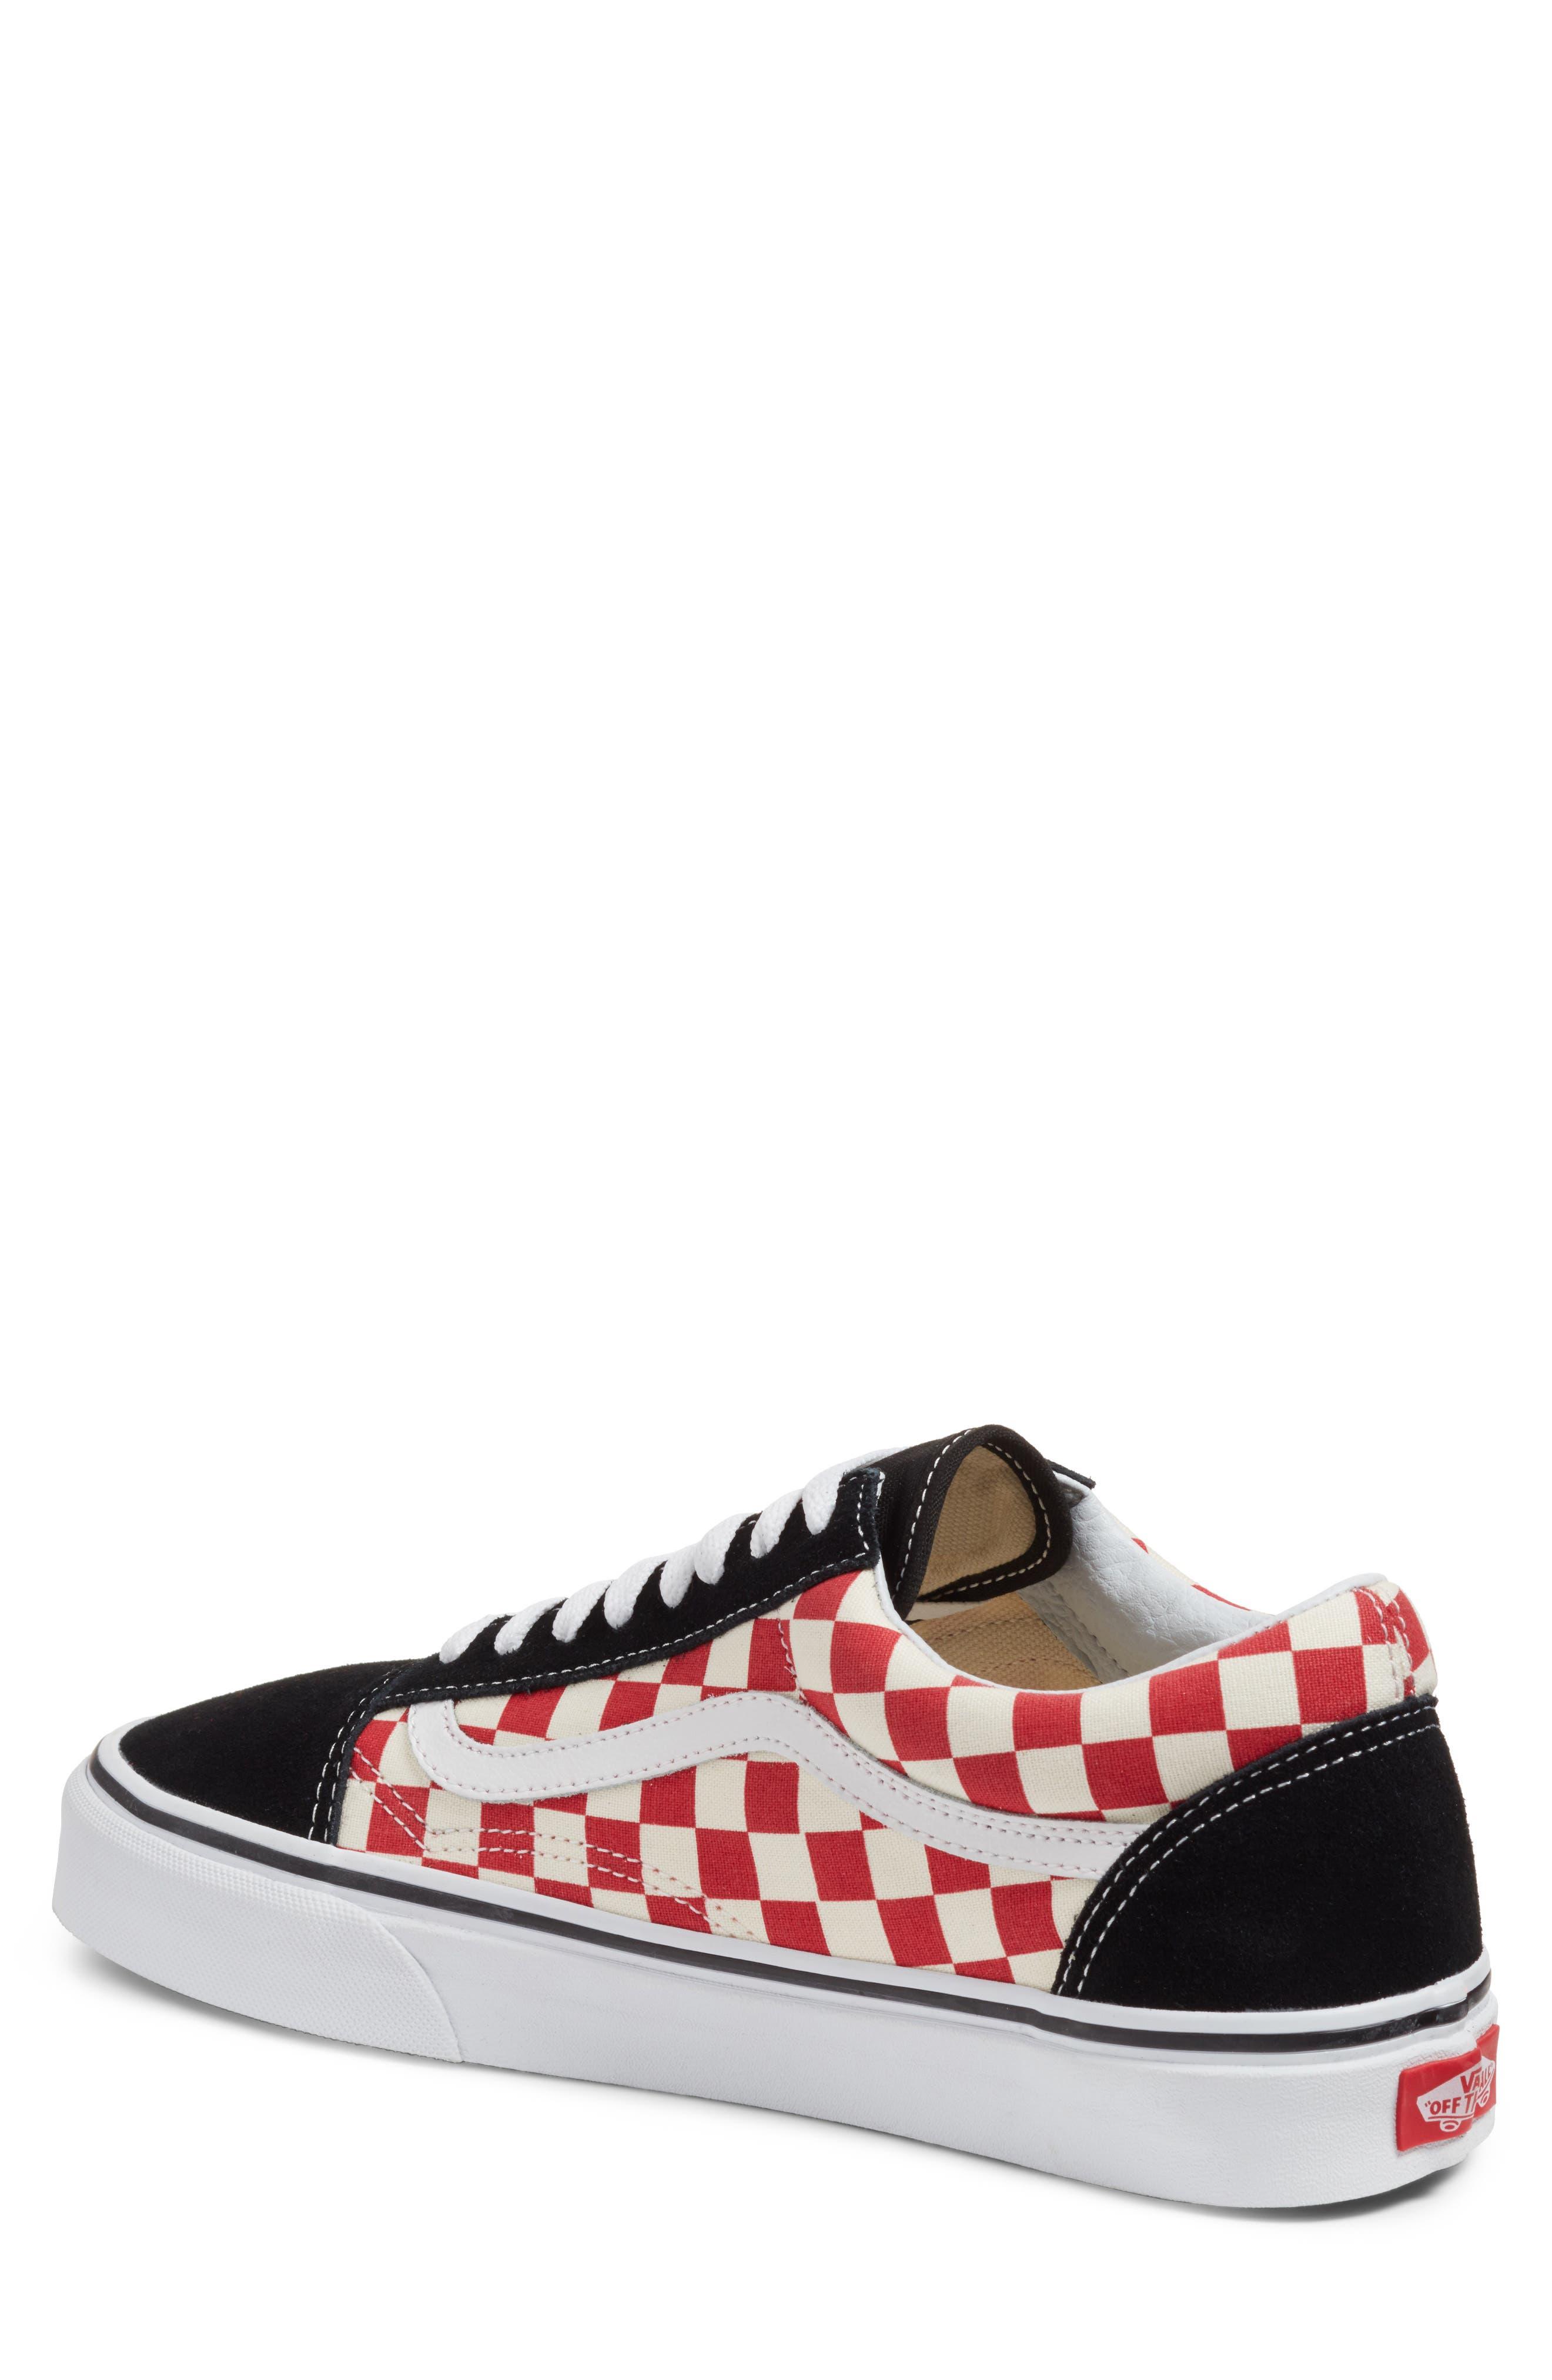 Old Skool Sneaker,                             Alternate thumbnail 2, color,                             Black/ Red Checkerboard